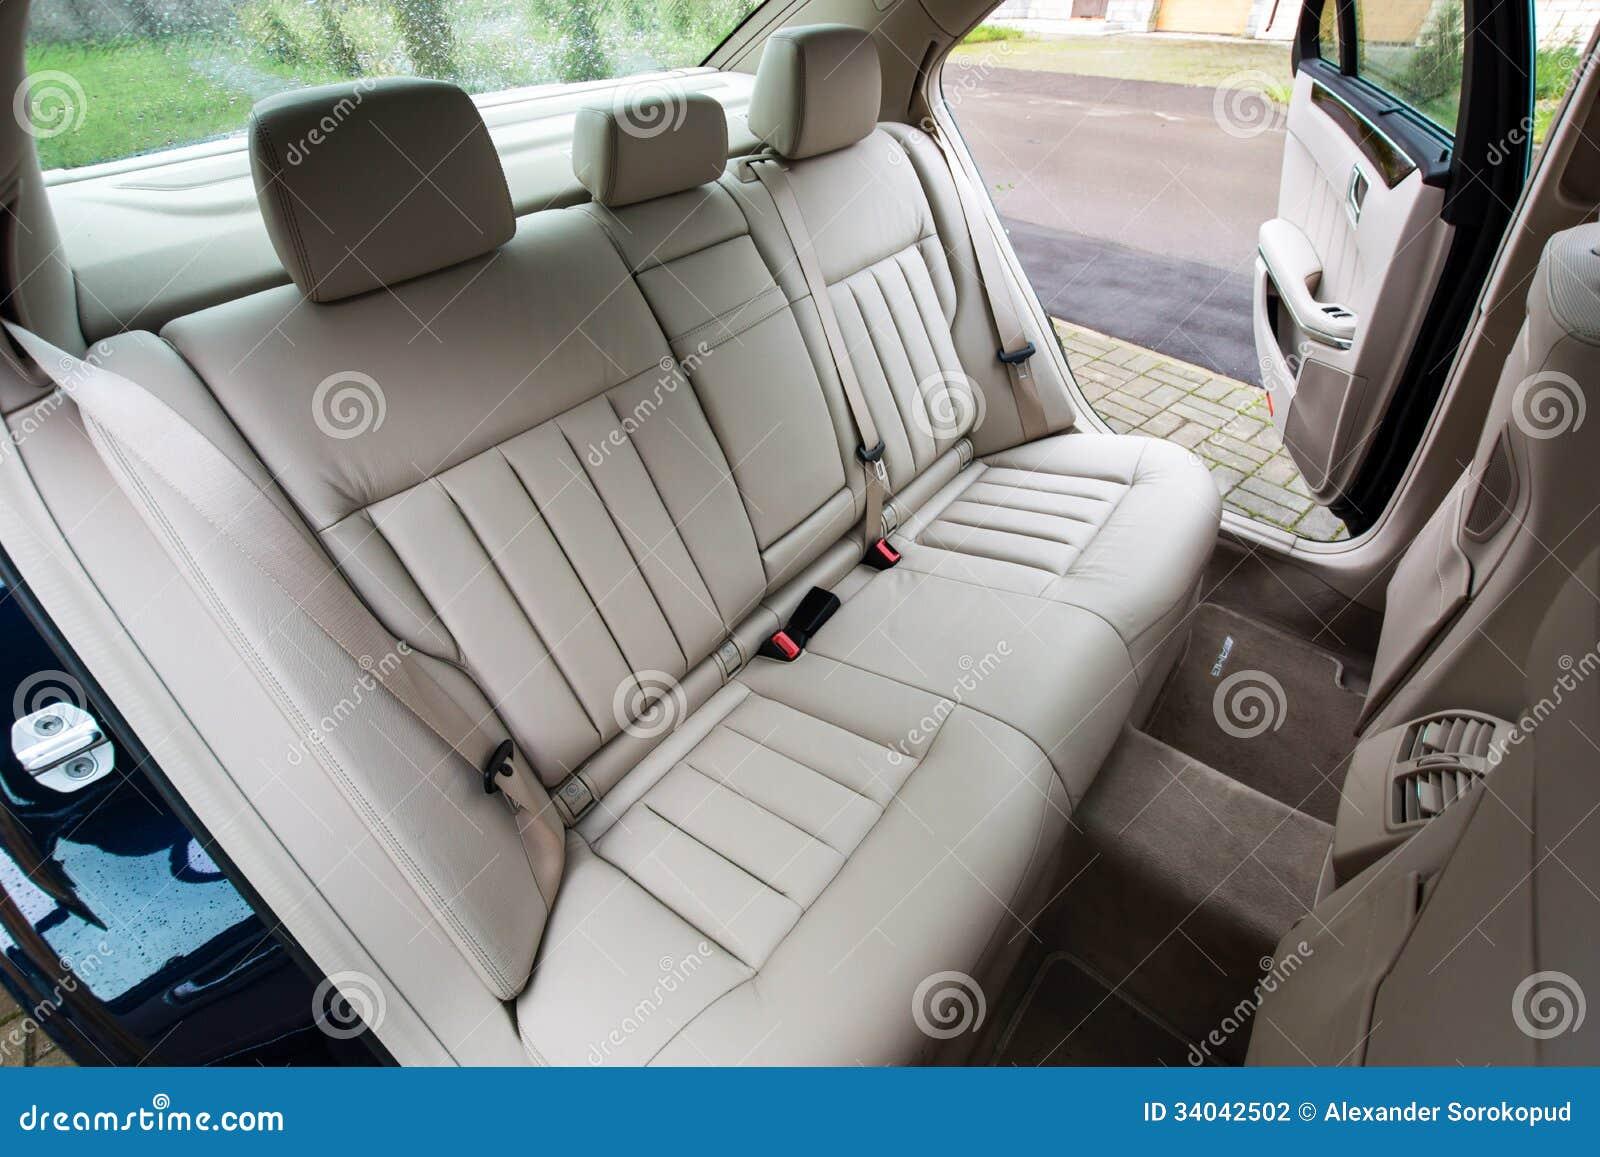 luxury car interior stock photography image 34042502. Black Bedroom Furniture Sets. Home Design Ideas